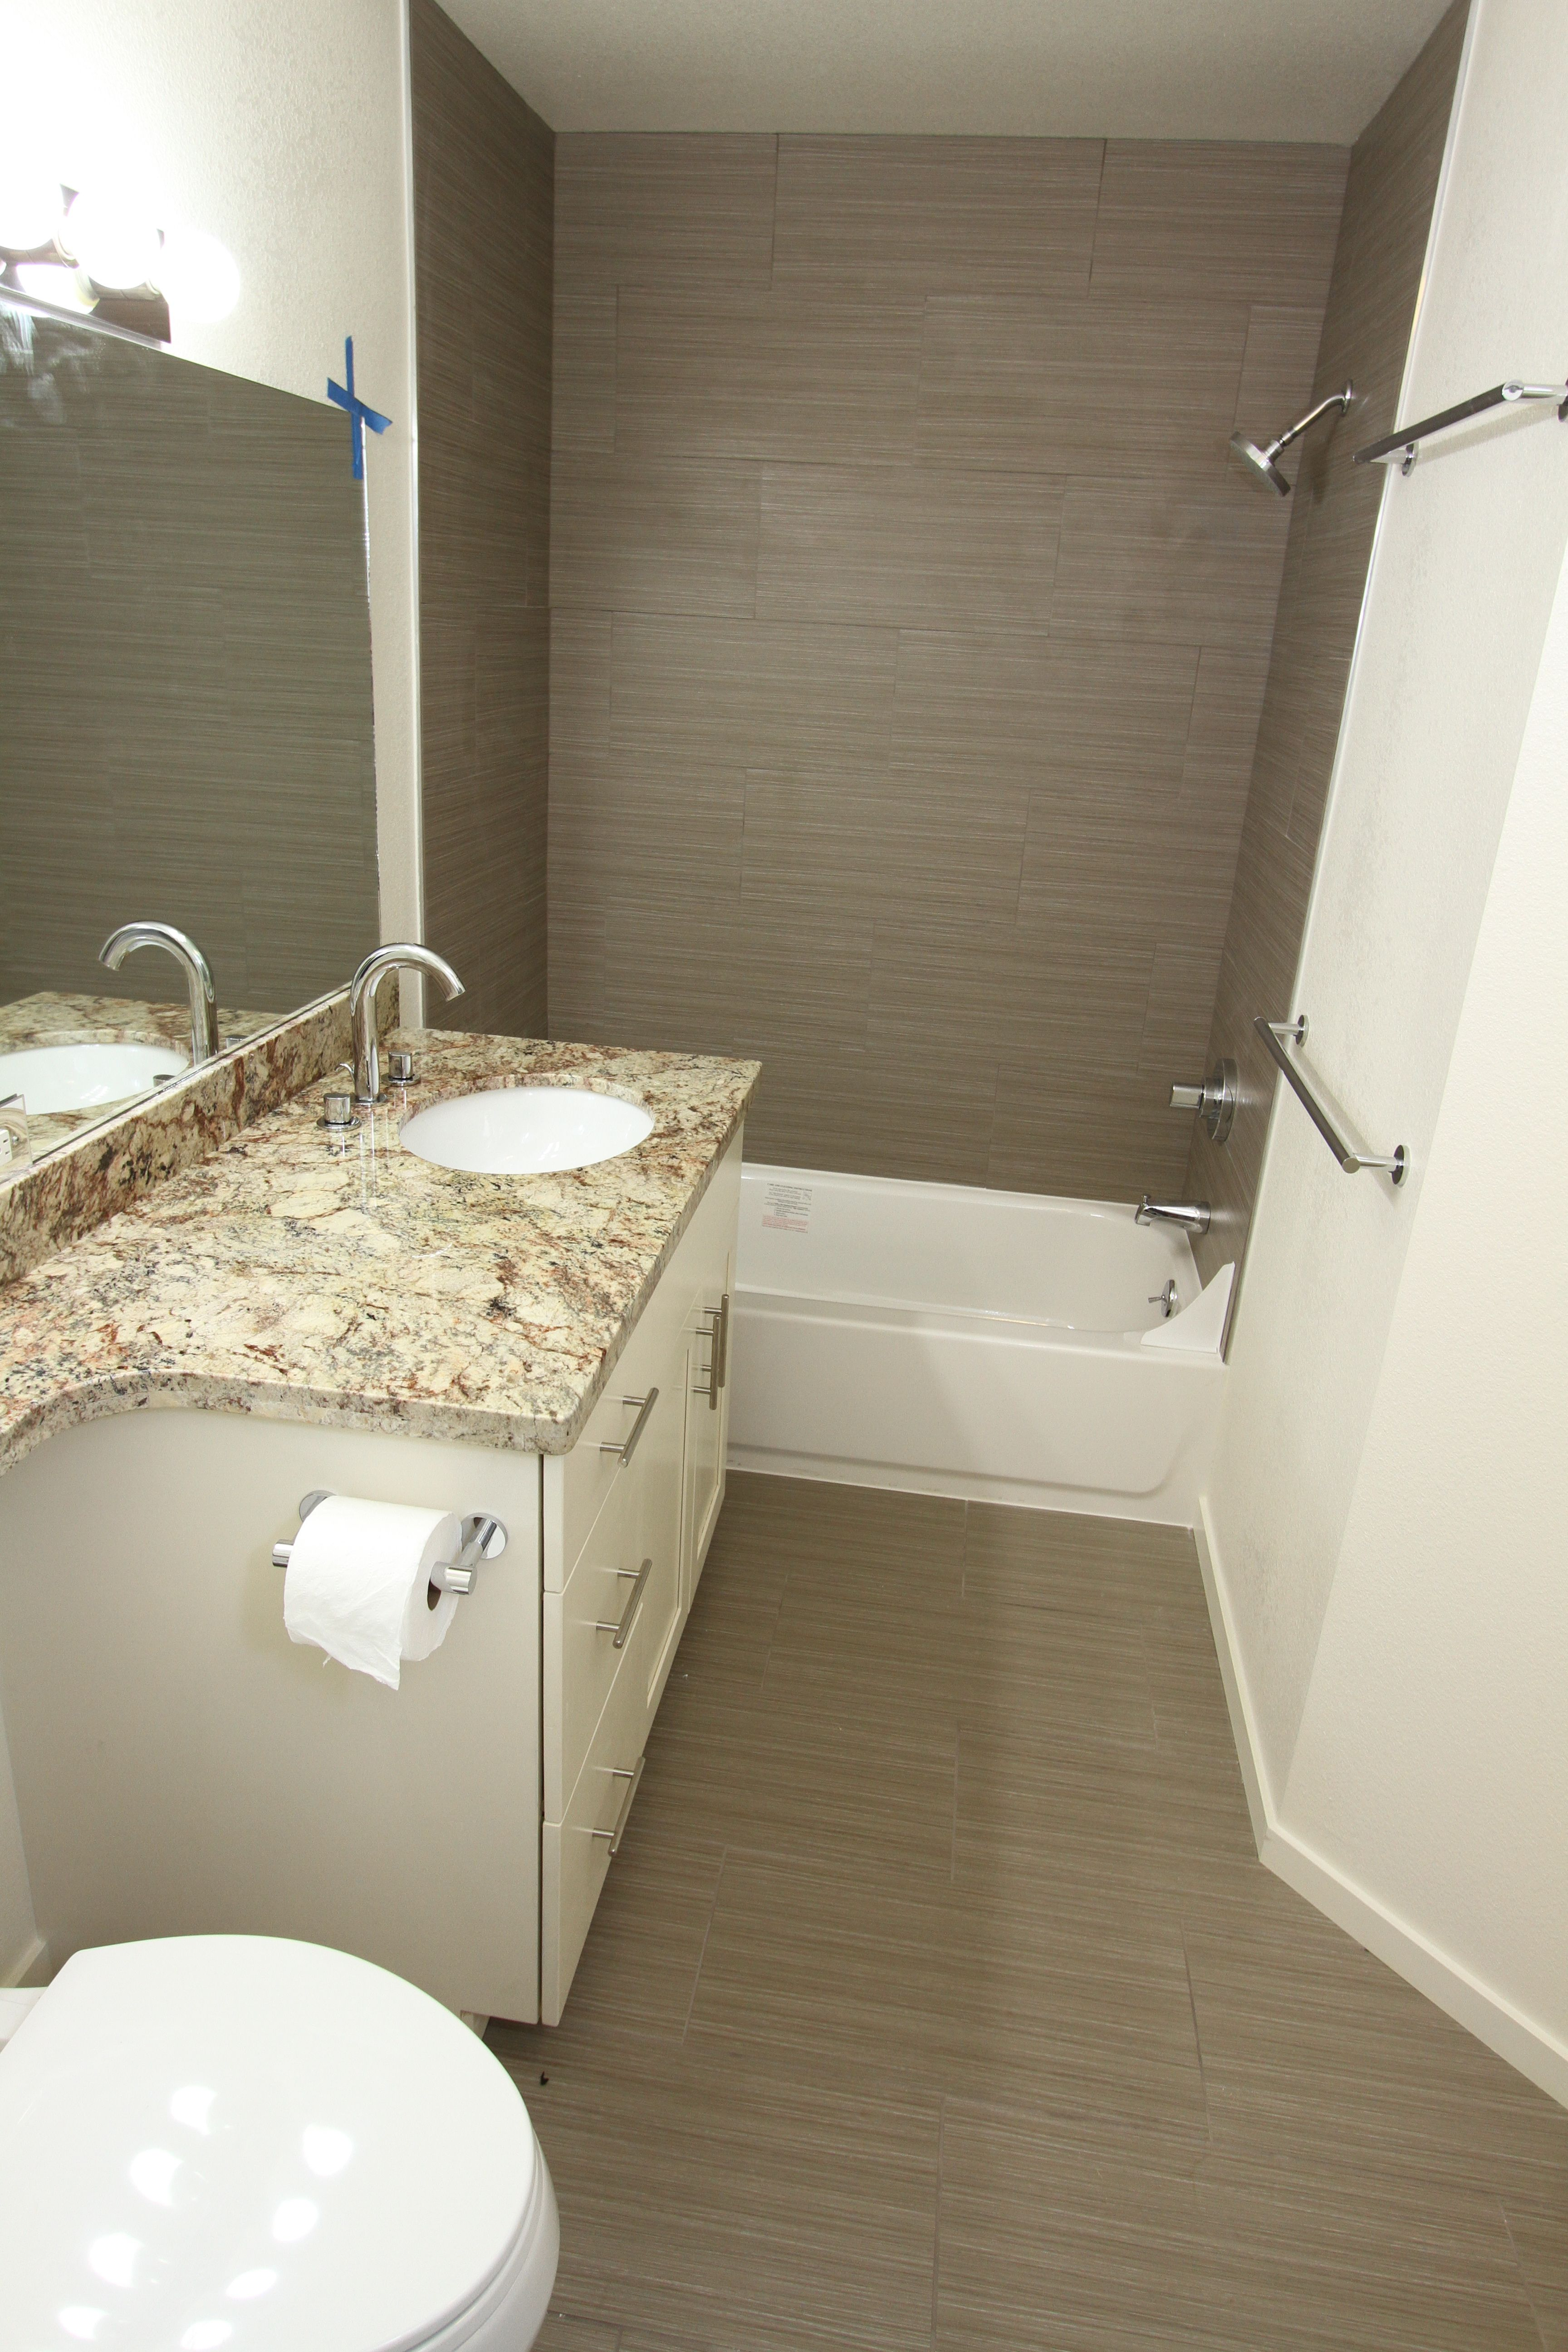 Bathroom Remodel Oahu Hawaii  AllBuild Construction